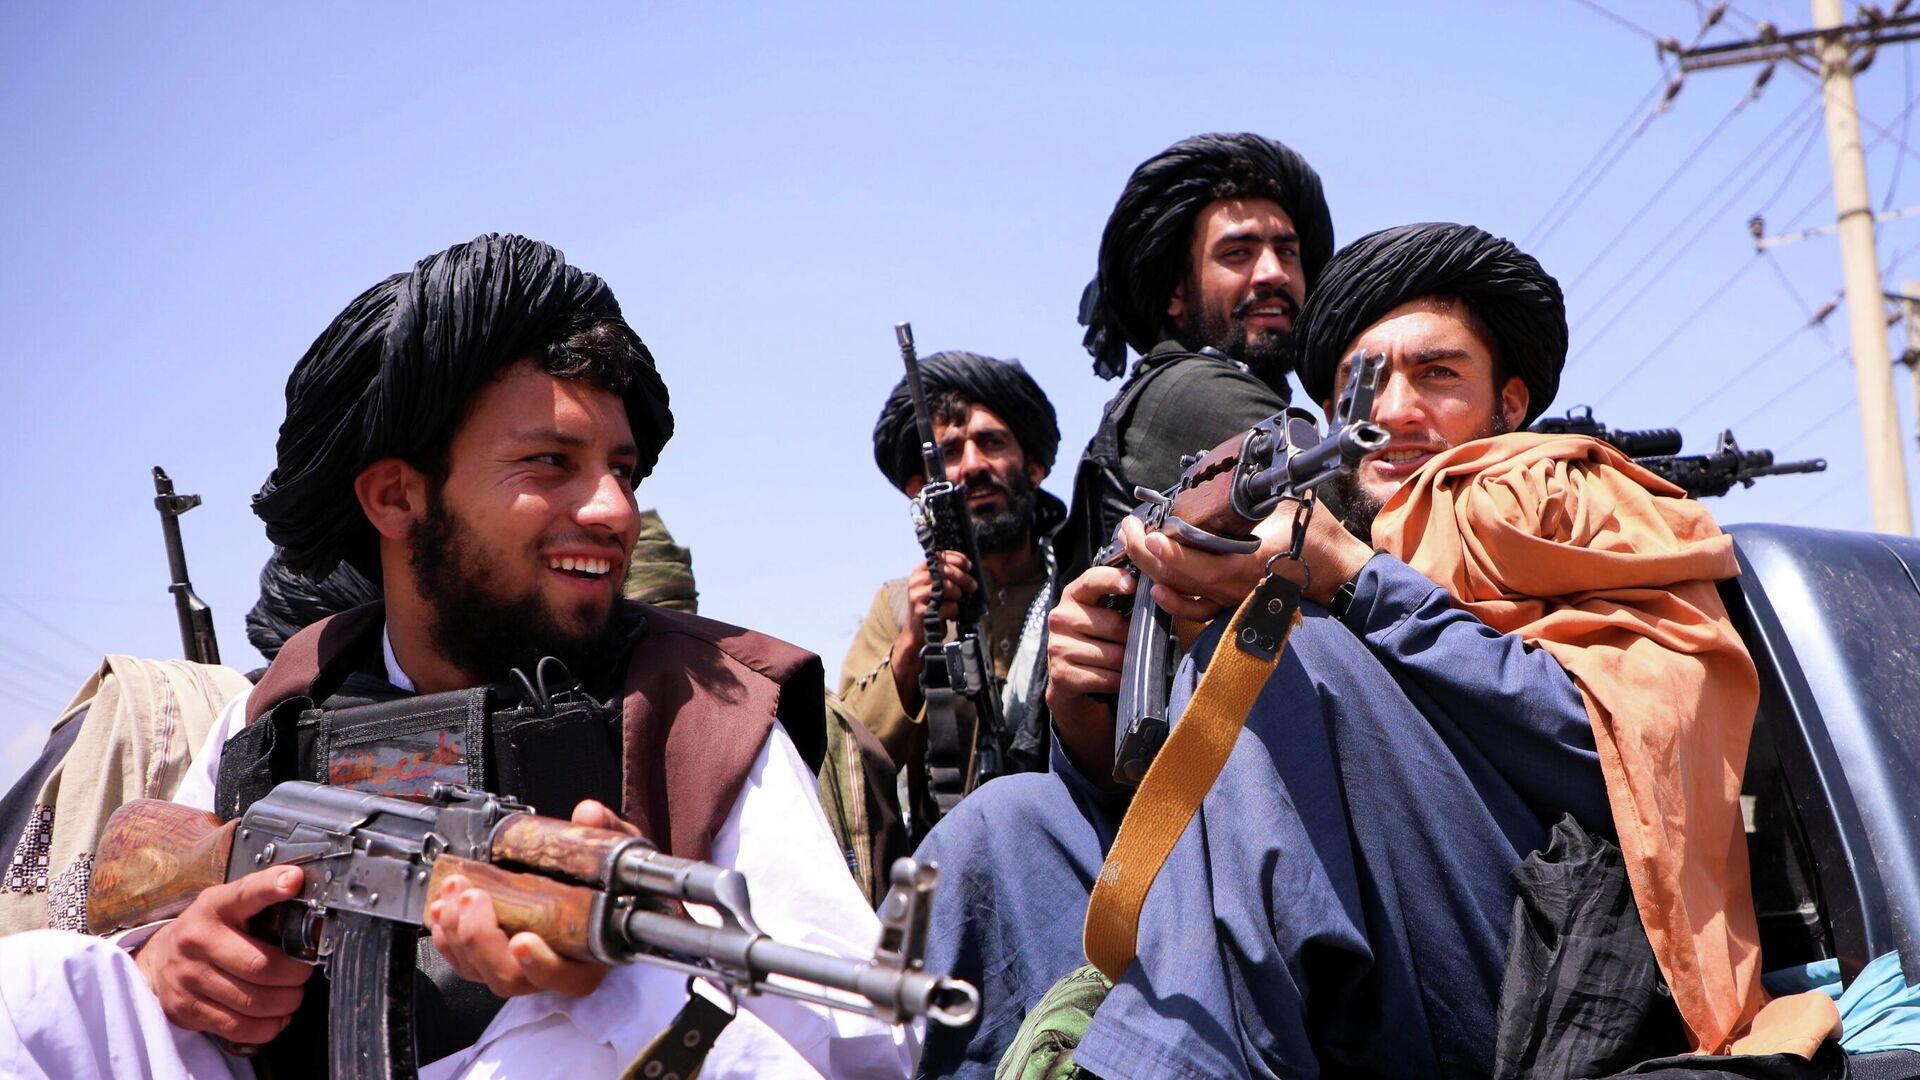 Боевики Талибана* возле аэропорта Кабула - РИА Новости, 1920, 09.09.2021